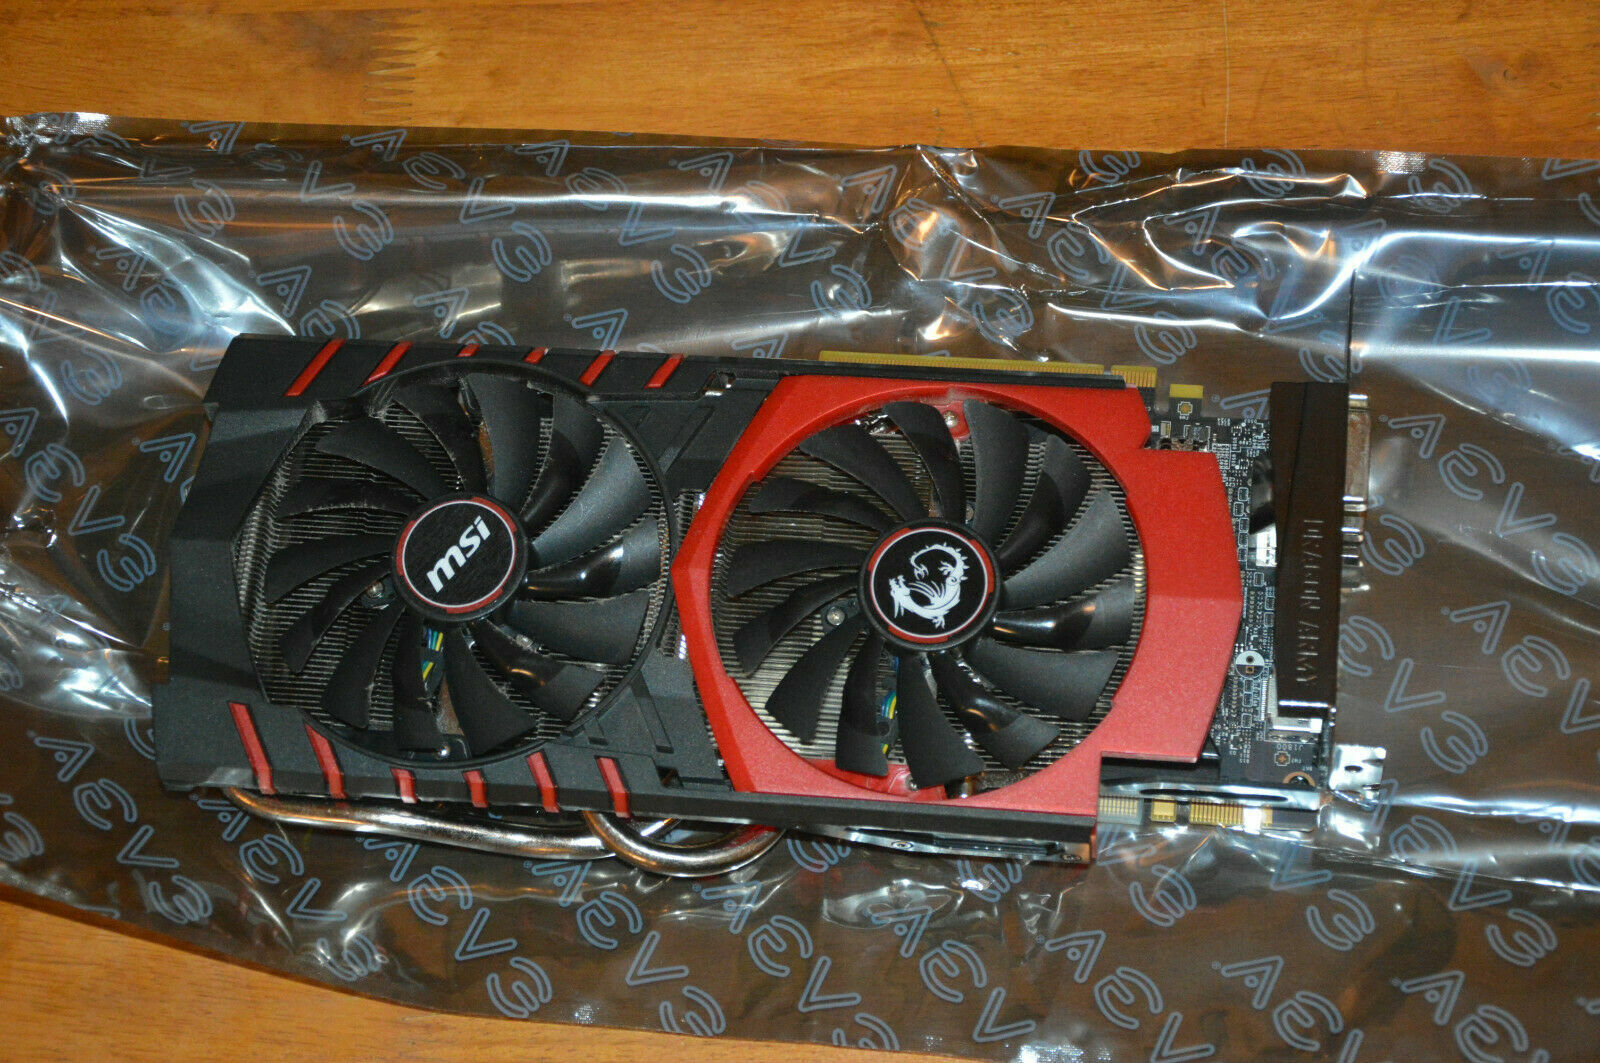 MSI GeForce GTX 970 4GB Gaming 4G Graphics Card